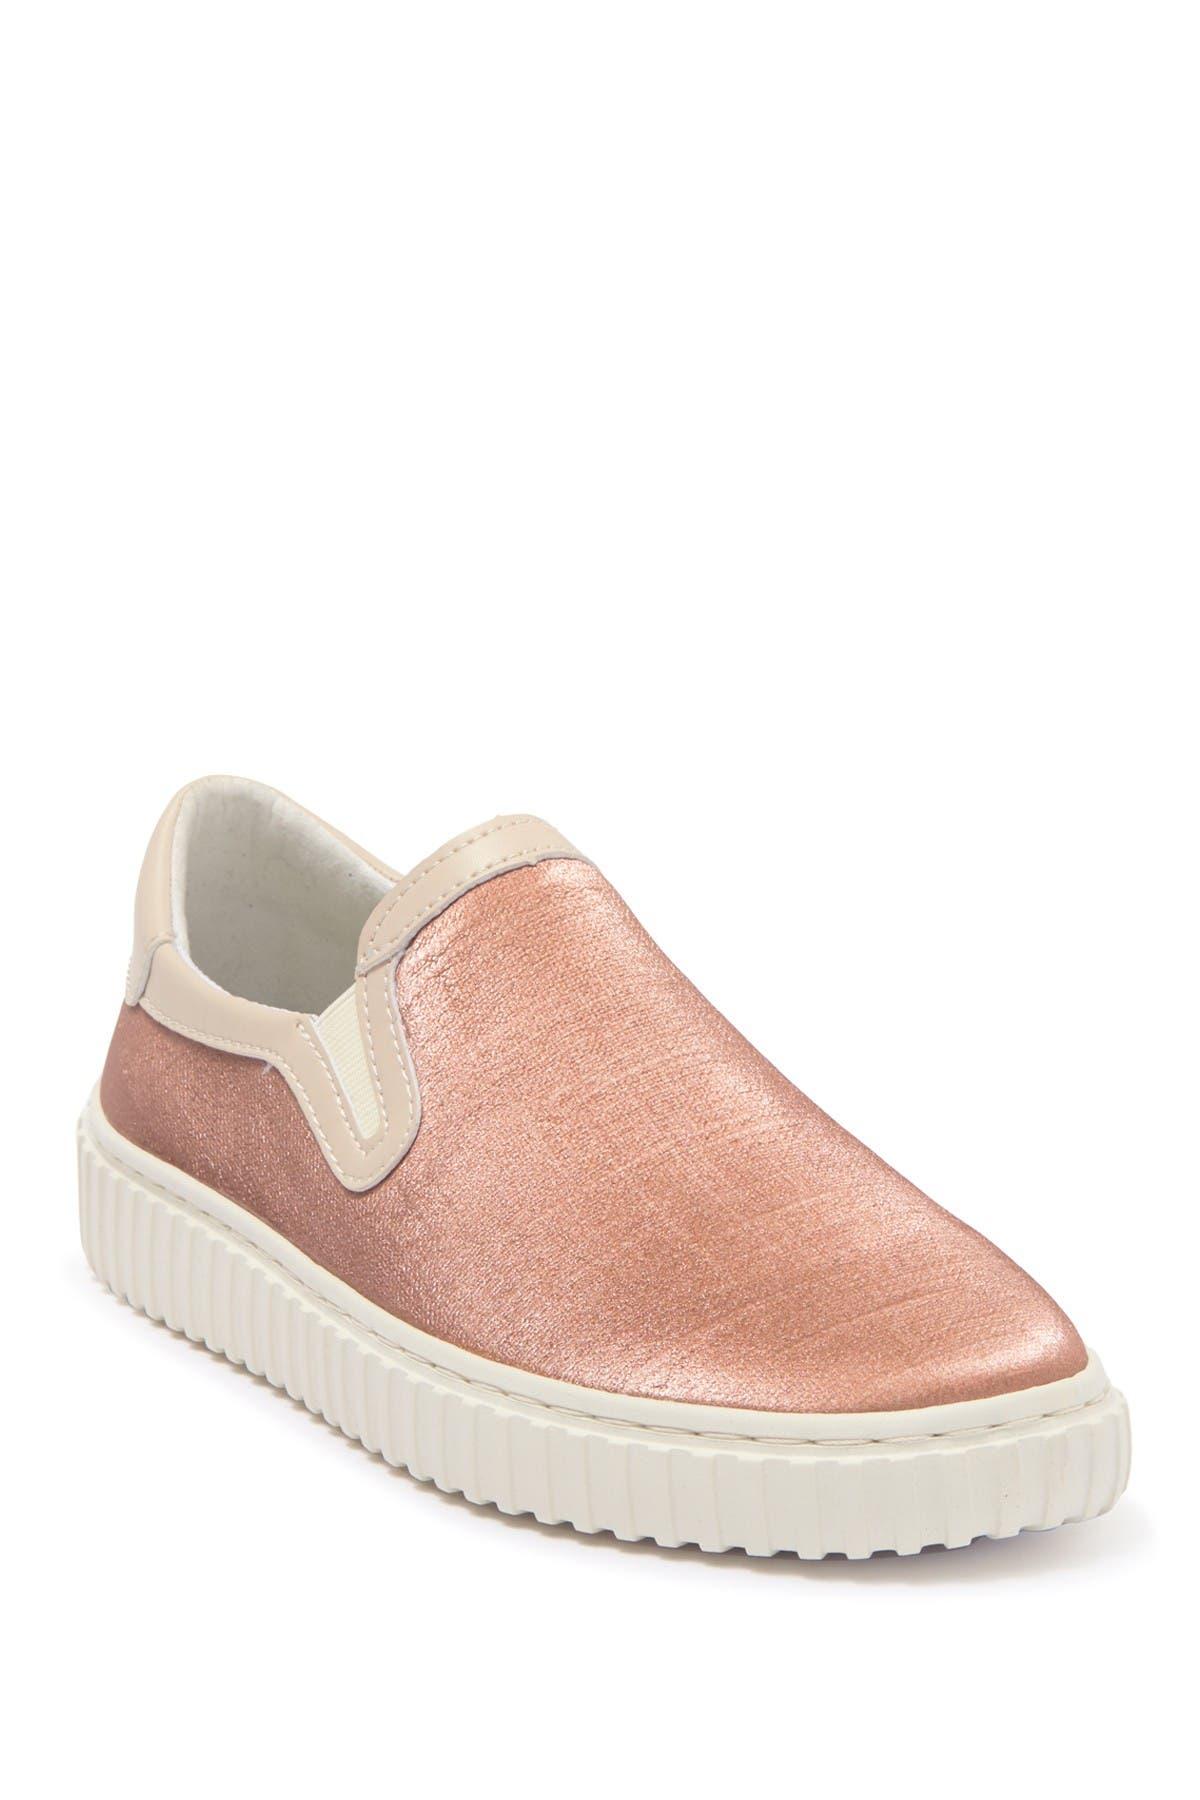 Image of Creative Recreation Boccia Metallic Slip-On Sneaker